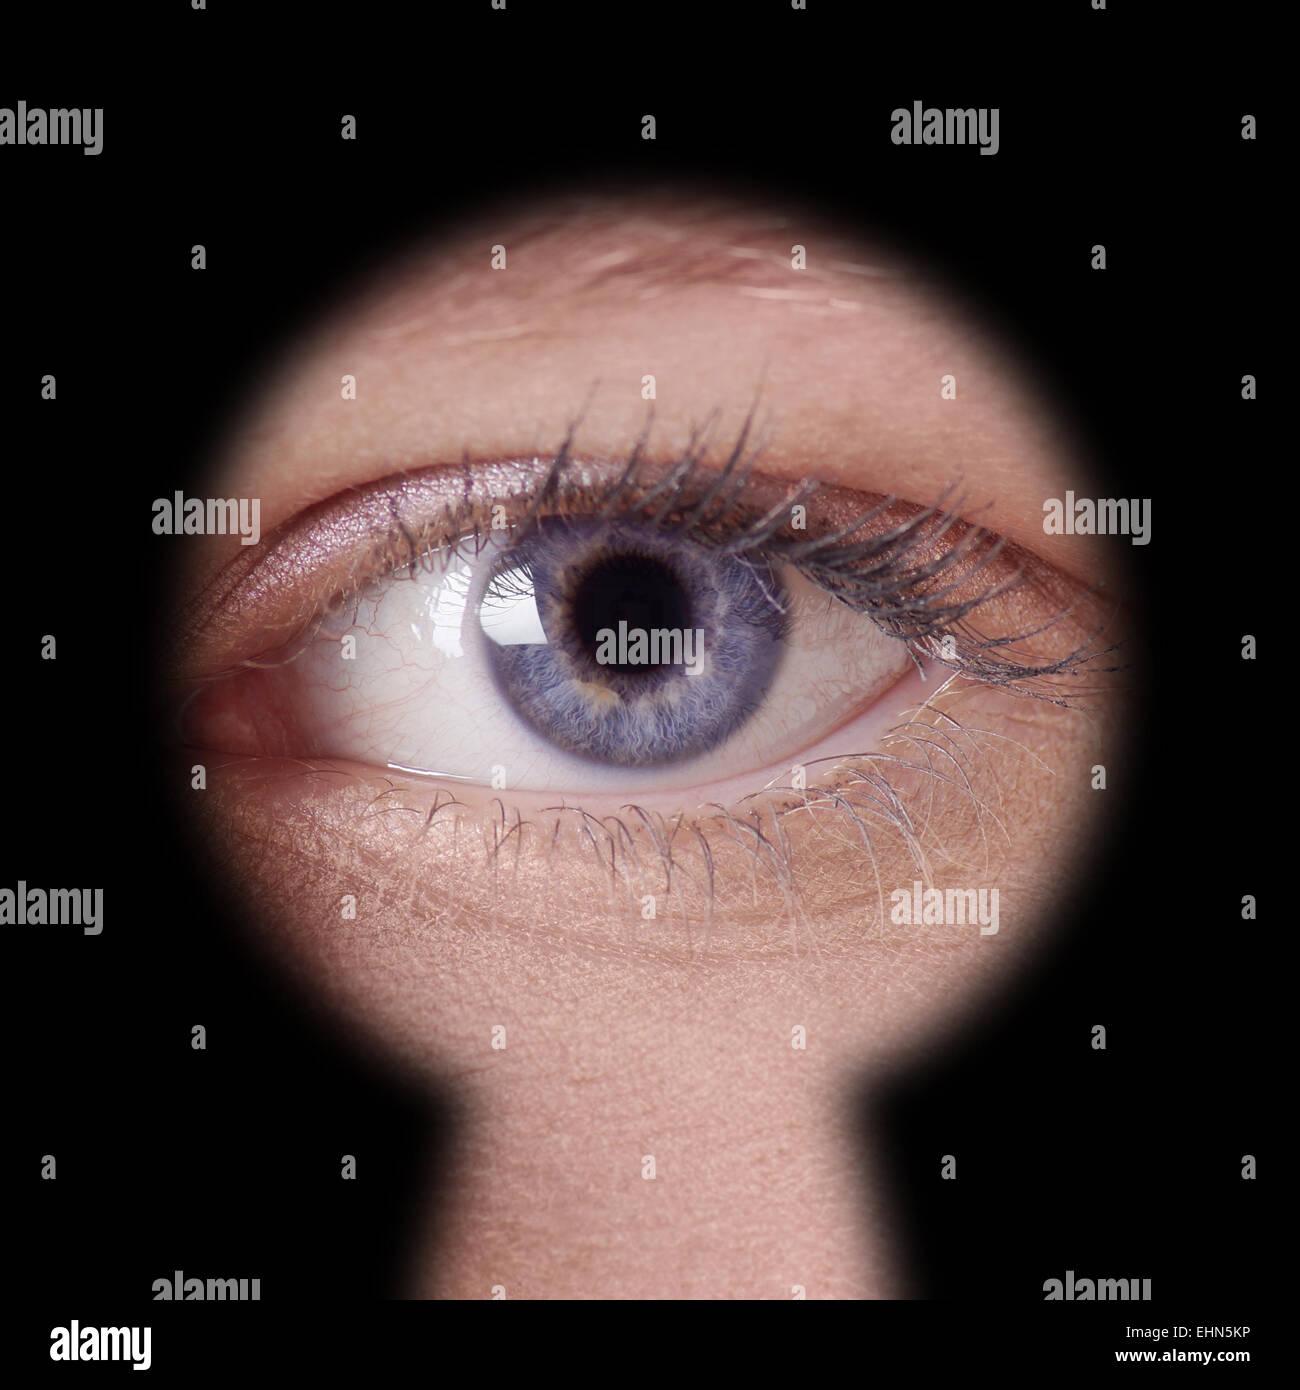 eye looking through keyhole - Stock Image